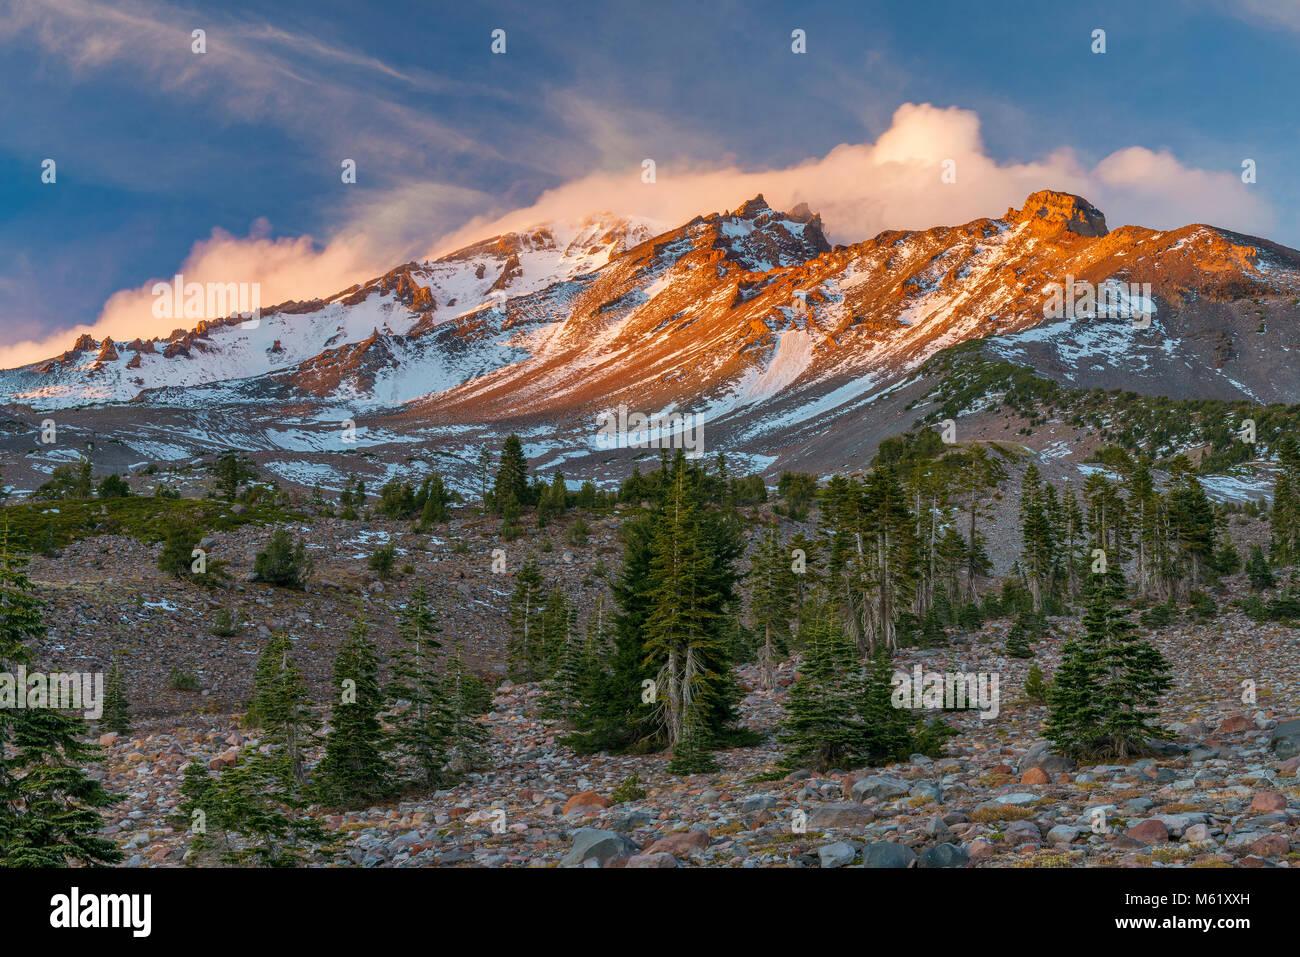 Mount Shasta, Panther Prato, Shasta-Trinity National Forest, California Immagini Stock